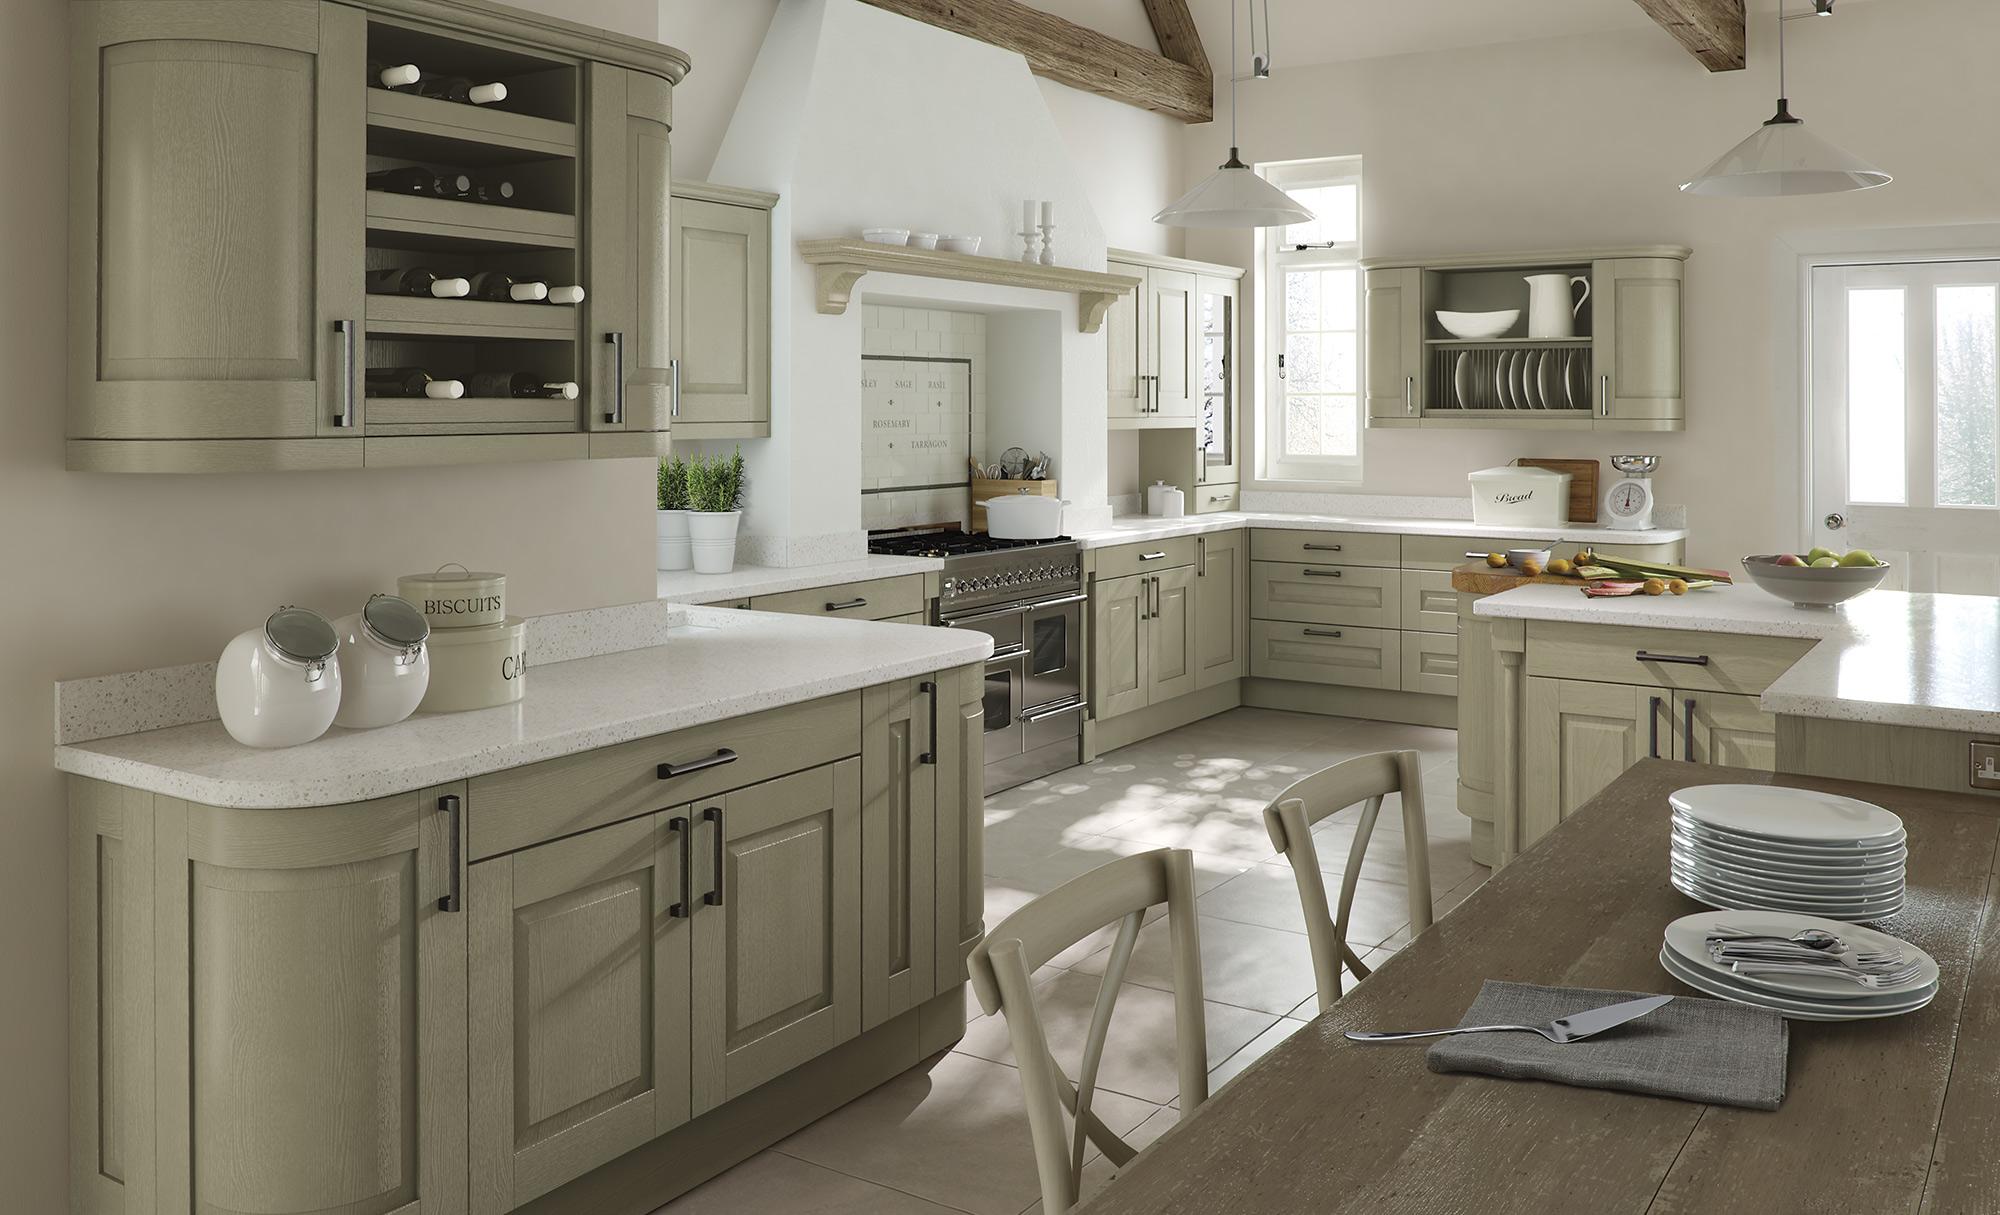 Windsor ClassicnSage Green Kitchen Stori